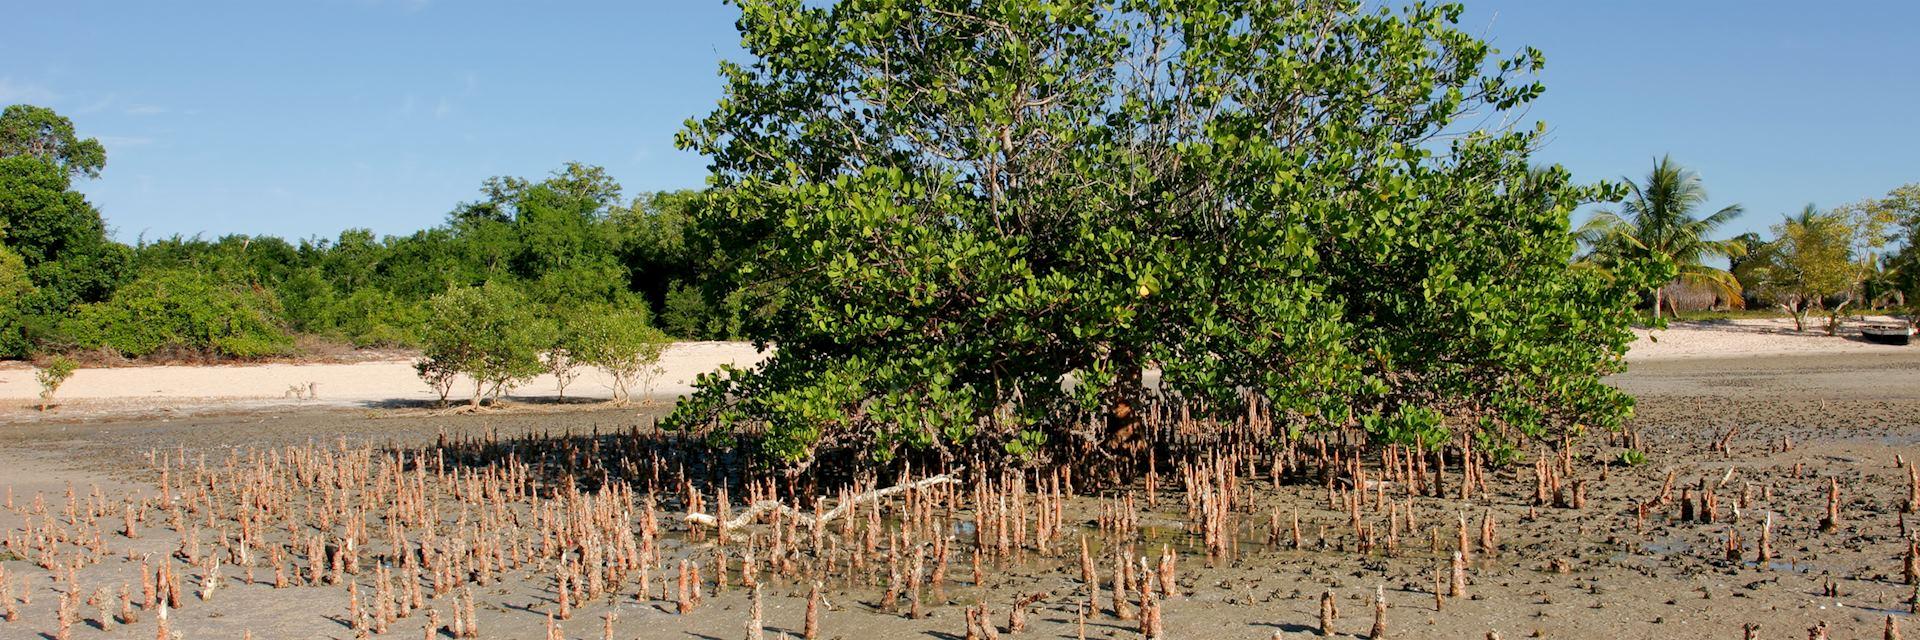 Mangrove tree in Vilanculos Coastal Wildlife Sanctuary